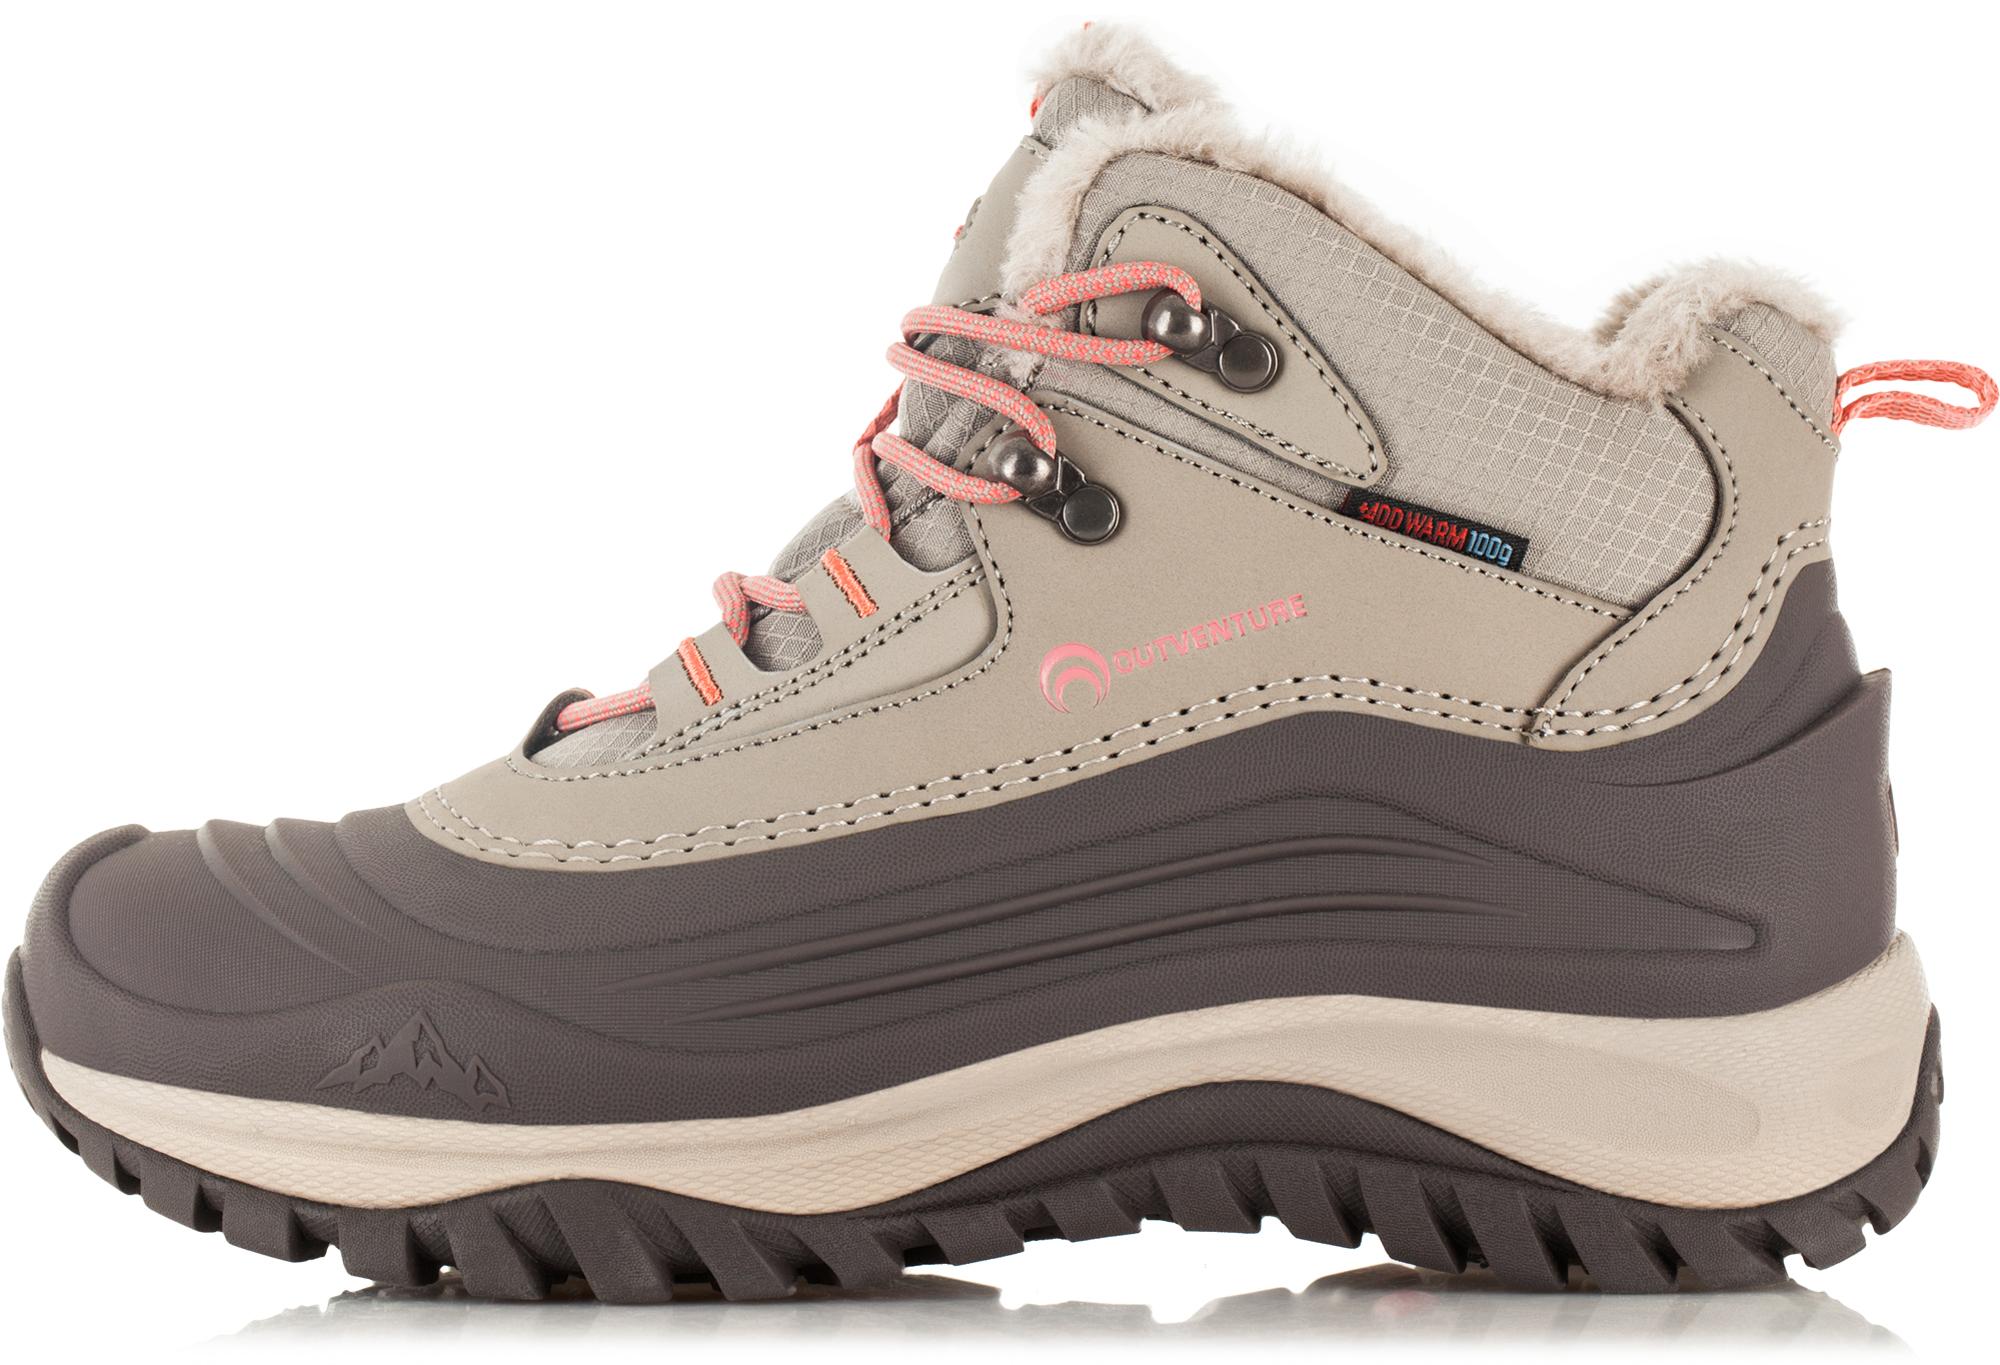 Outventure Ботинки утепленные женские Outventure Snowstorm, размер 41 outventure ботинки утепленные для мальчиков outventure